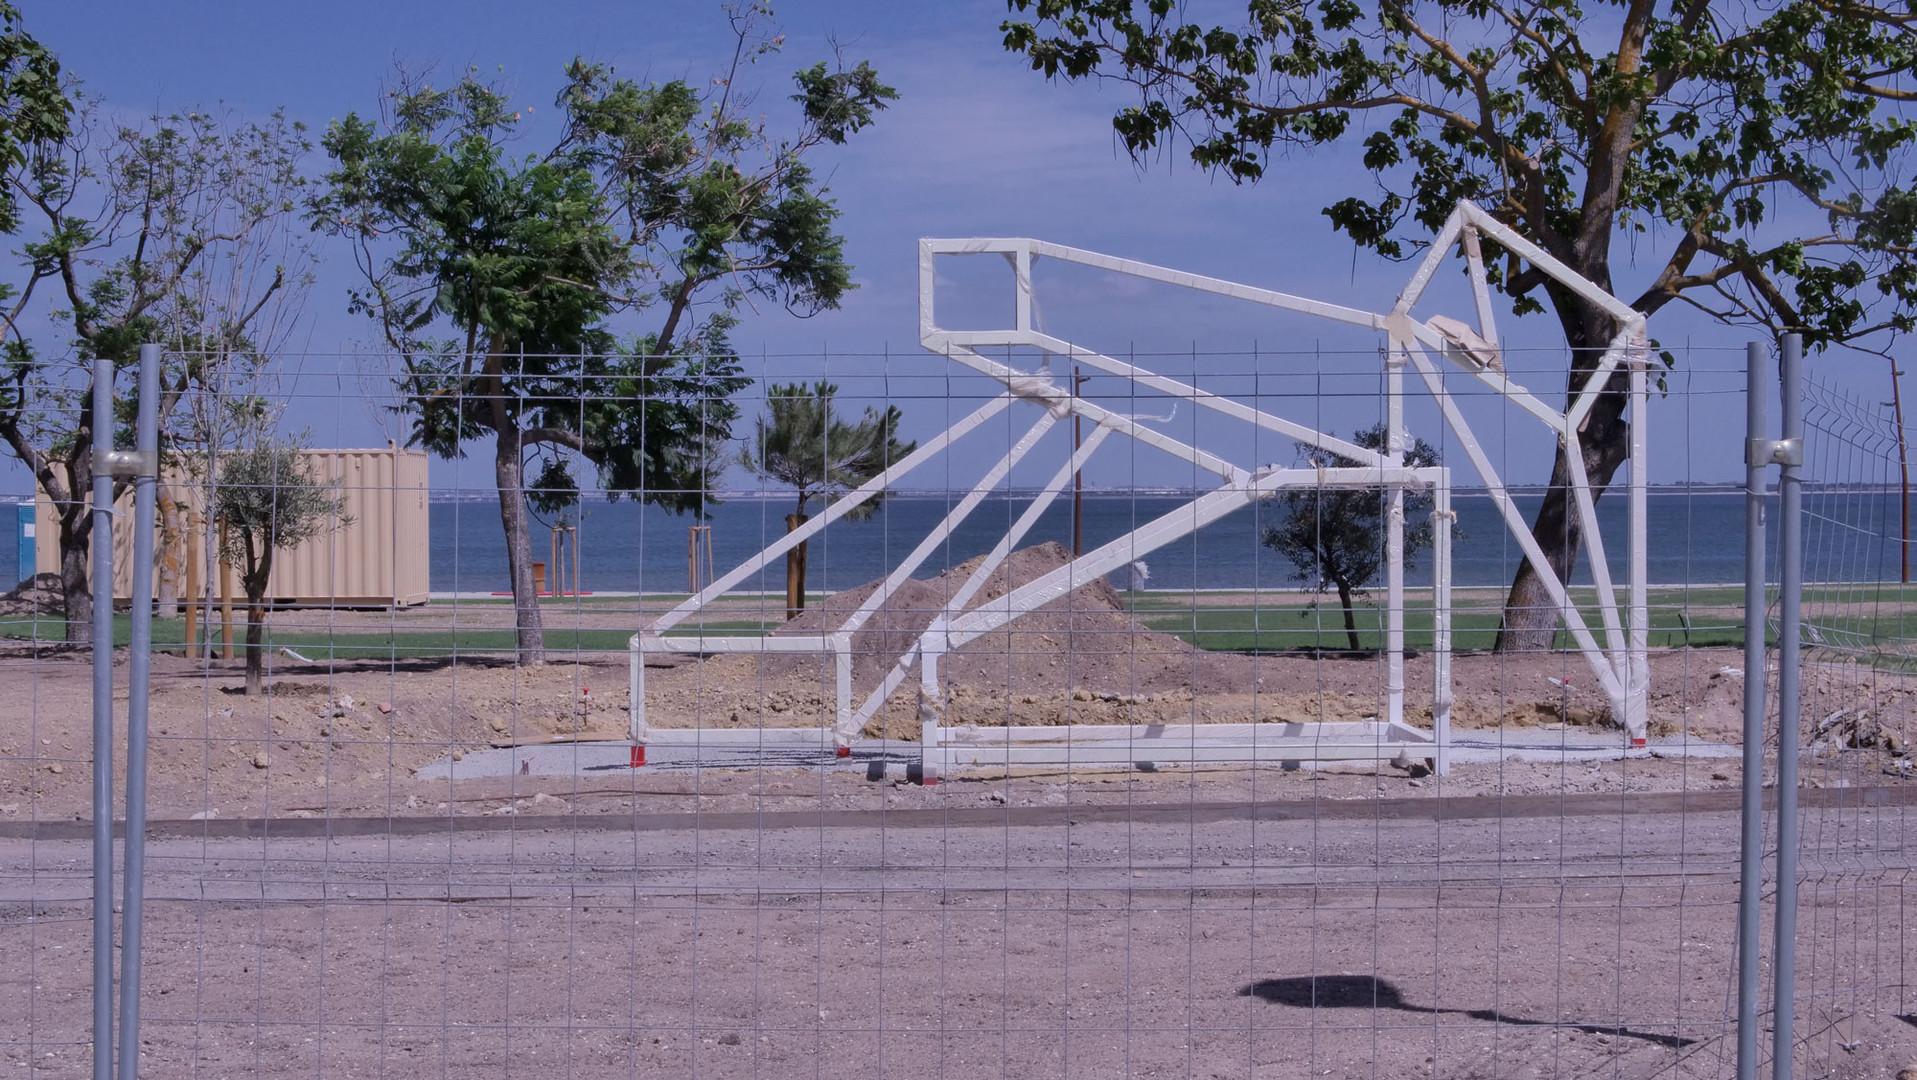 escultura-solar-5.jpg